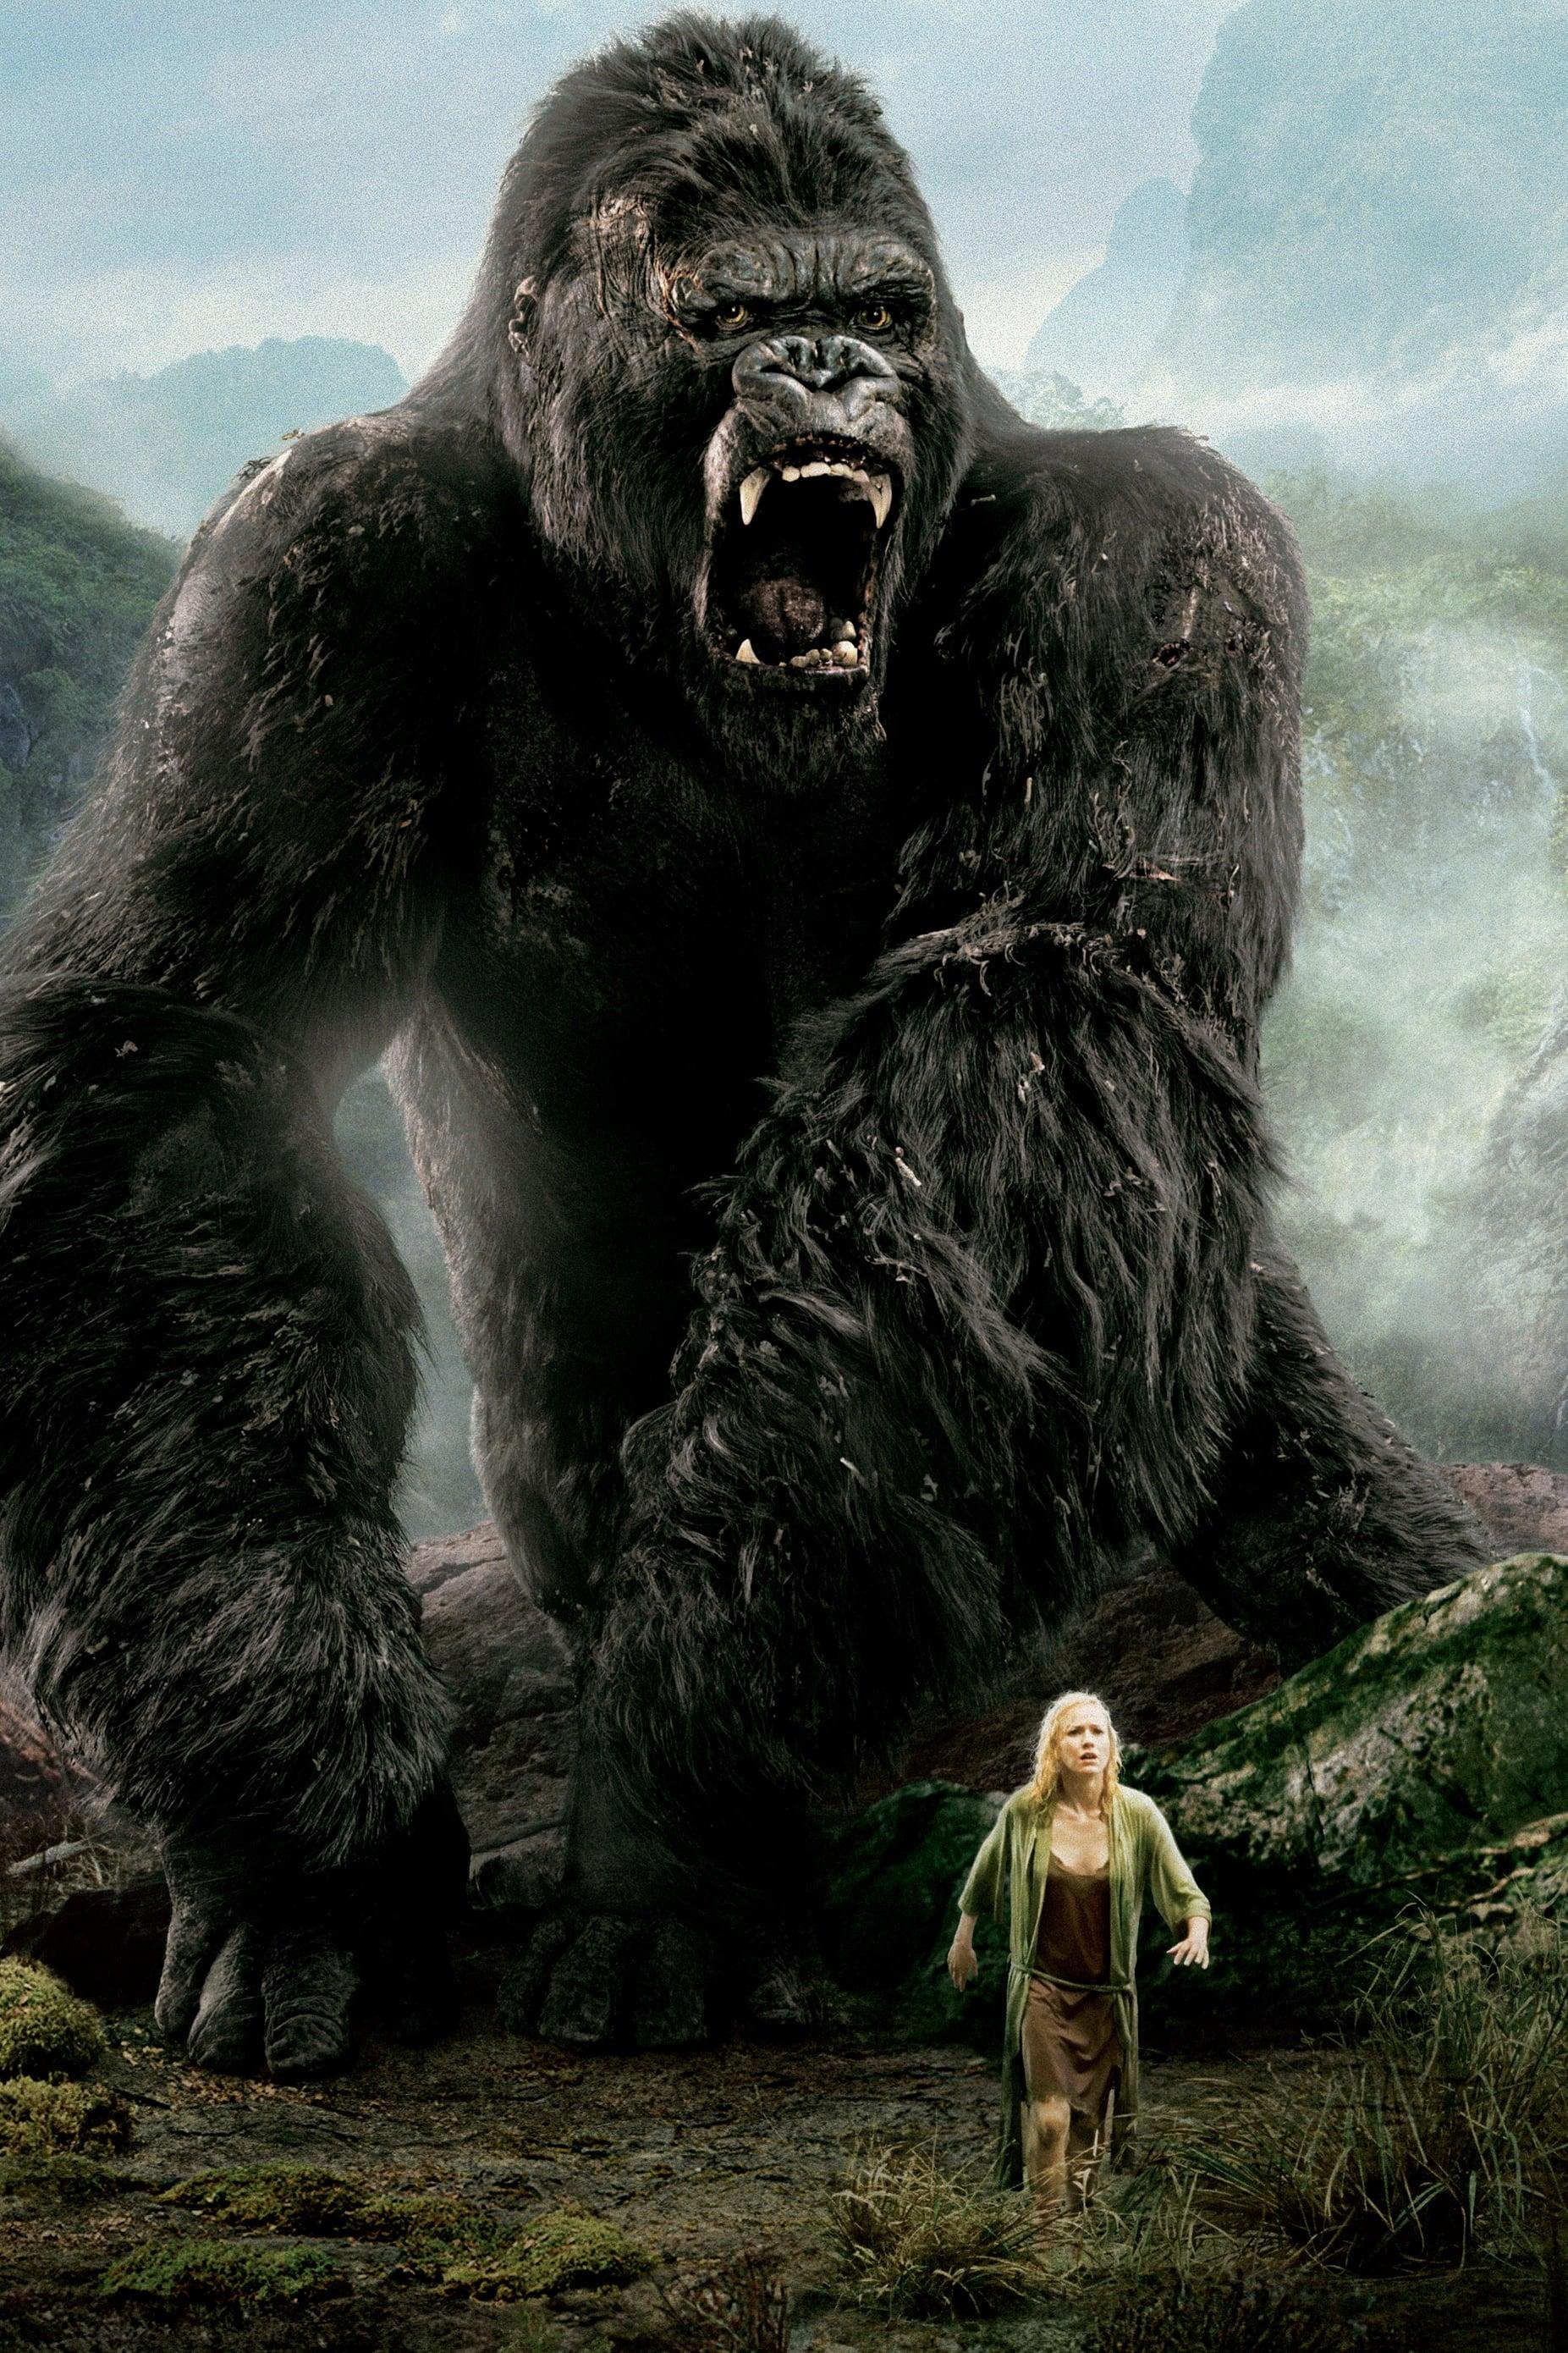 King Kong Streaming